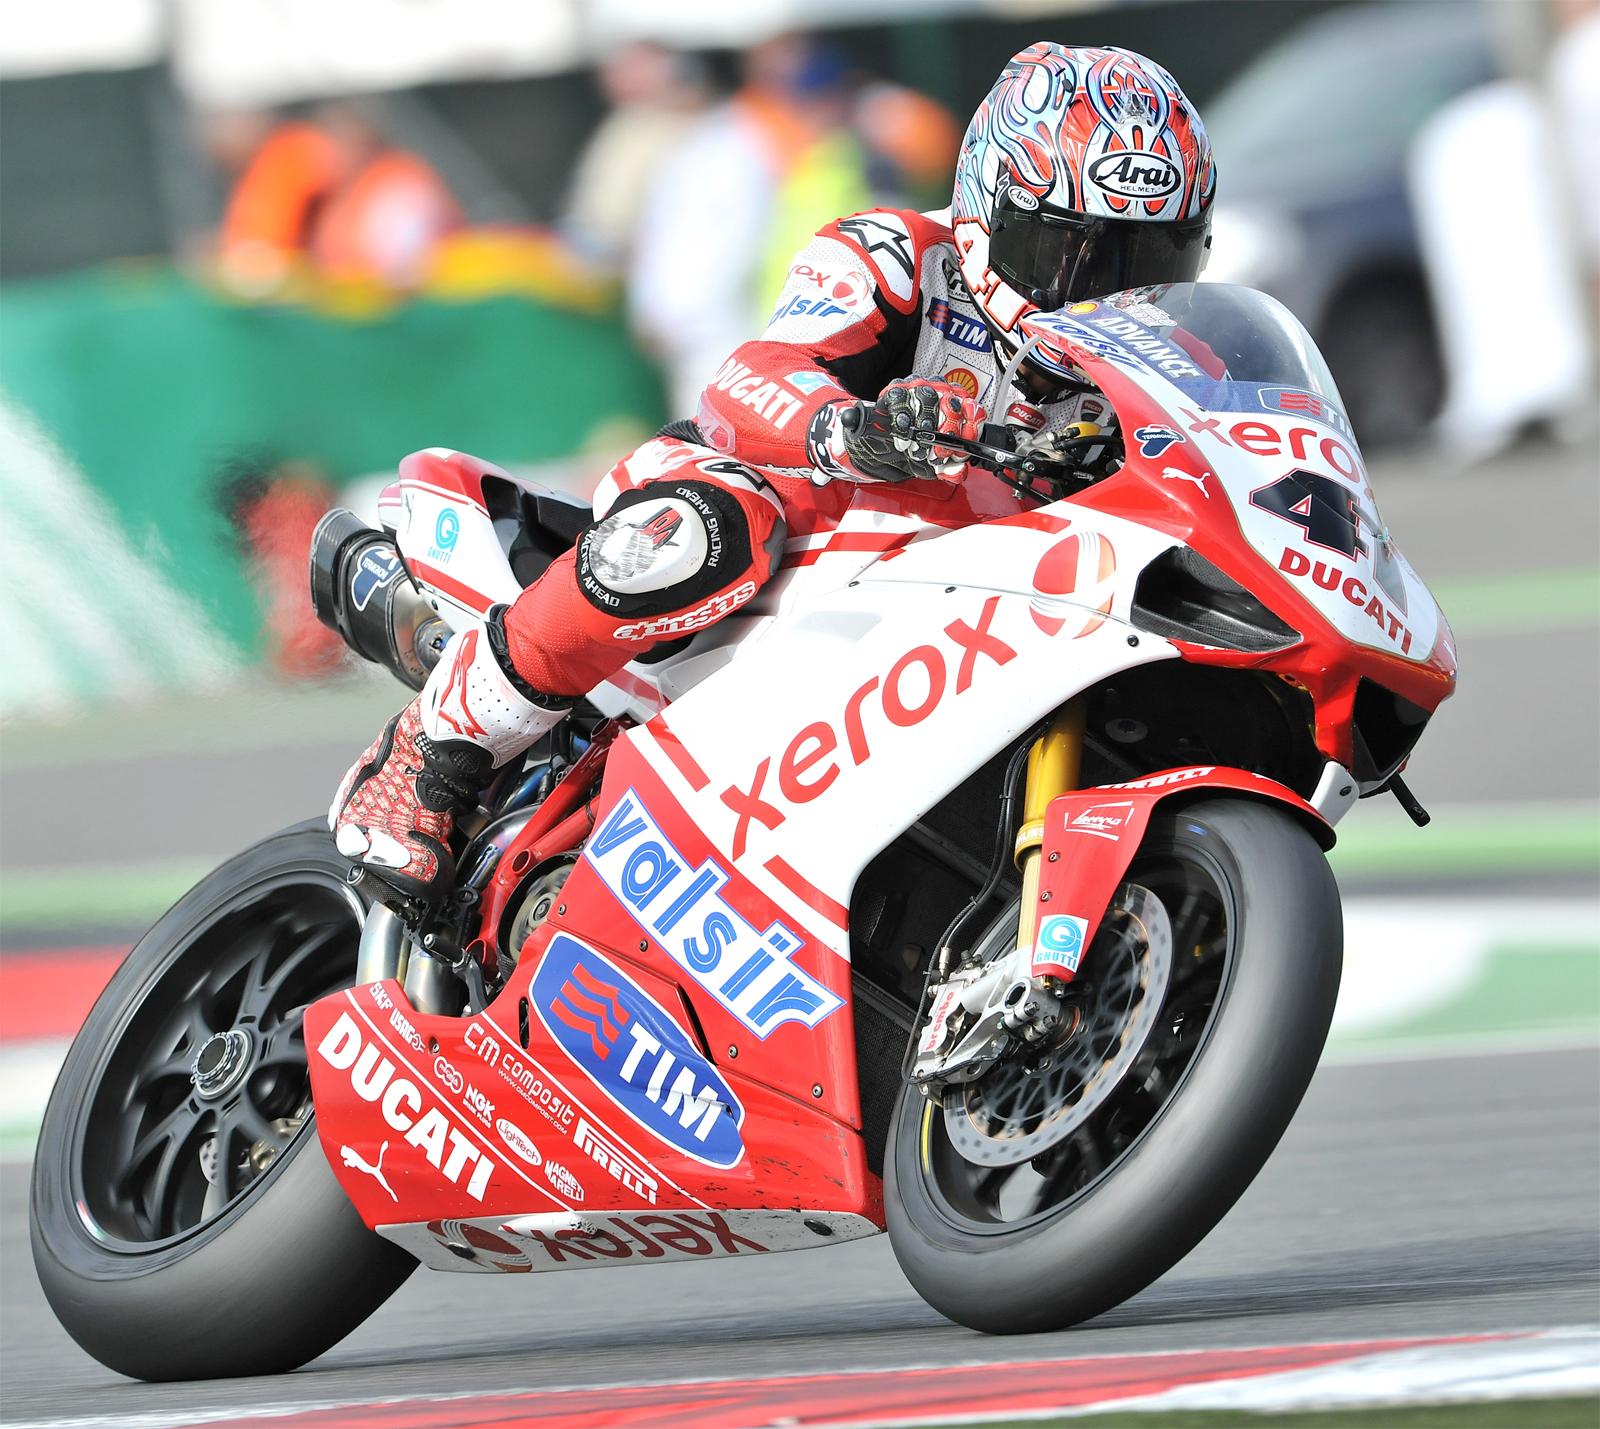 World Superbike Images Gallery: 2010 Superbike Racing